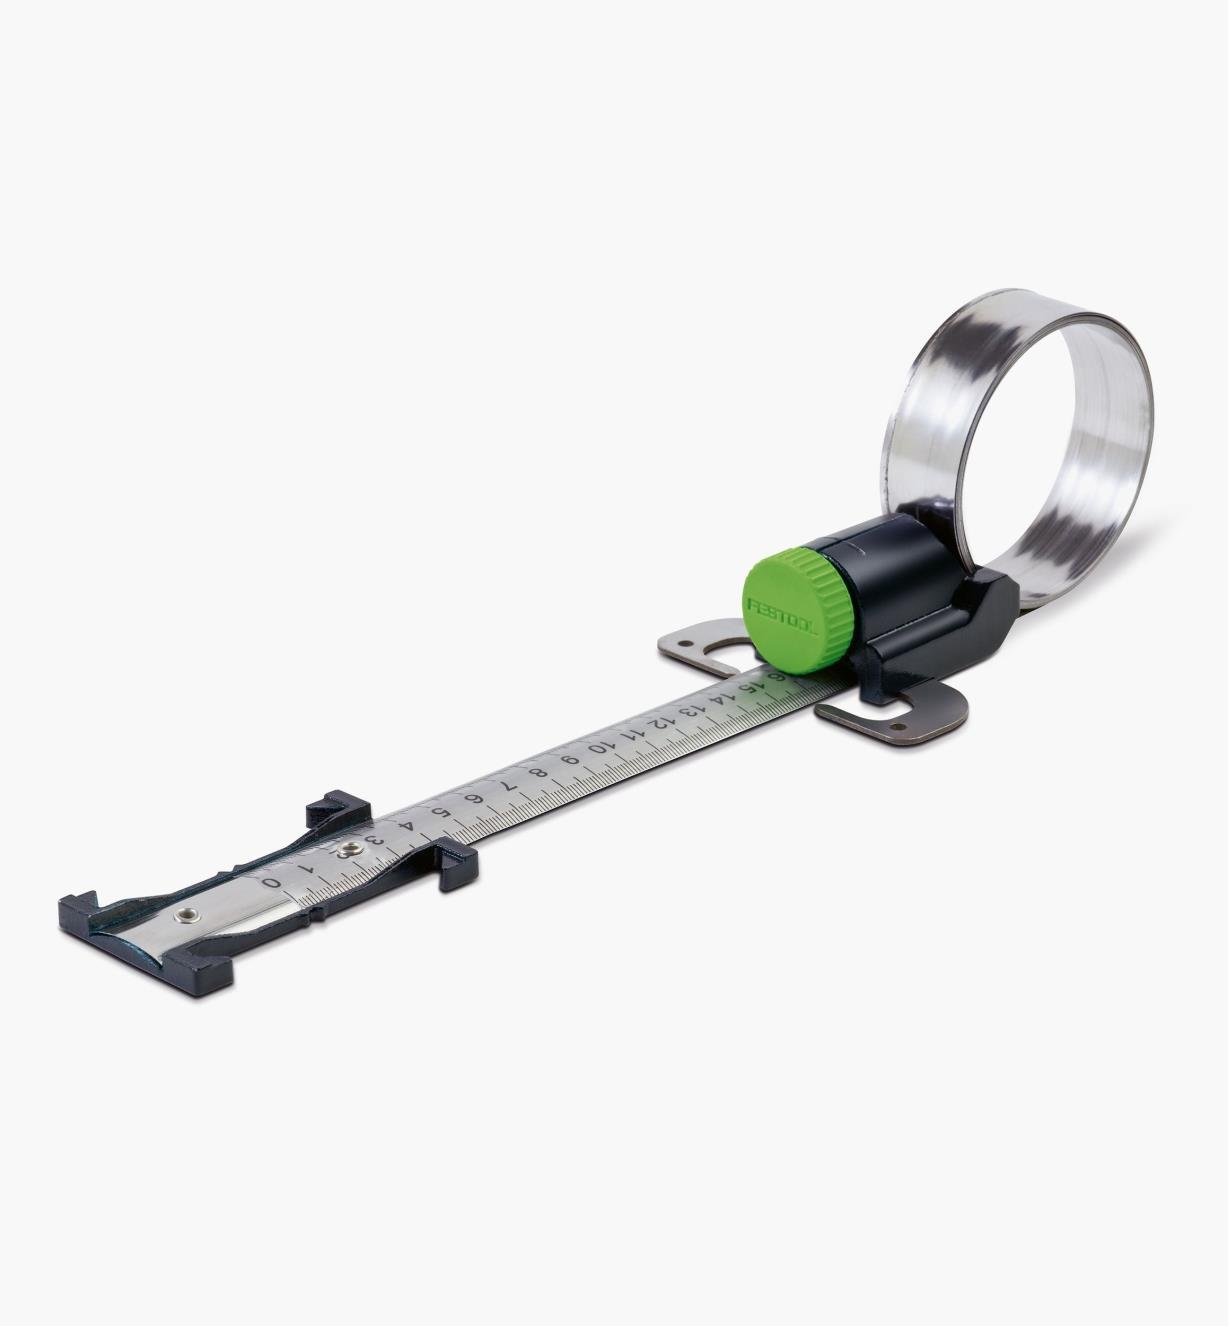 ZA497304 - Circle Cutter for Festool PS 420 & PSB 420 Carvex Jigsaws